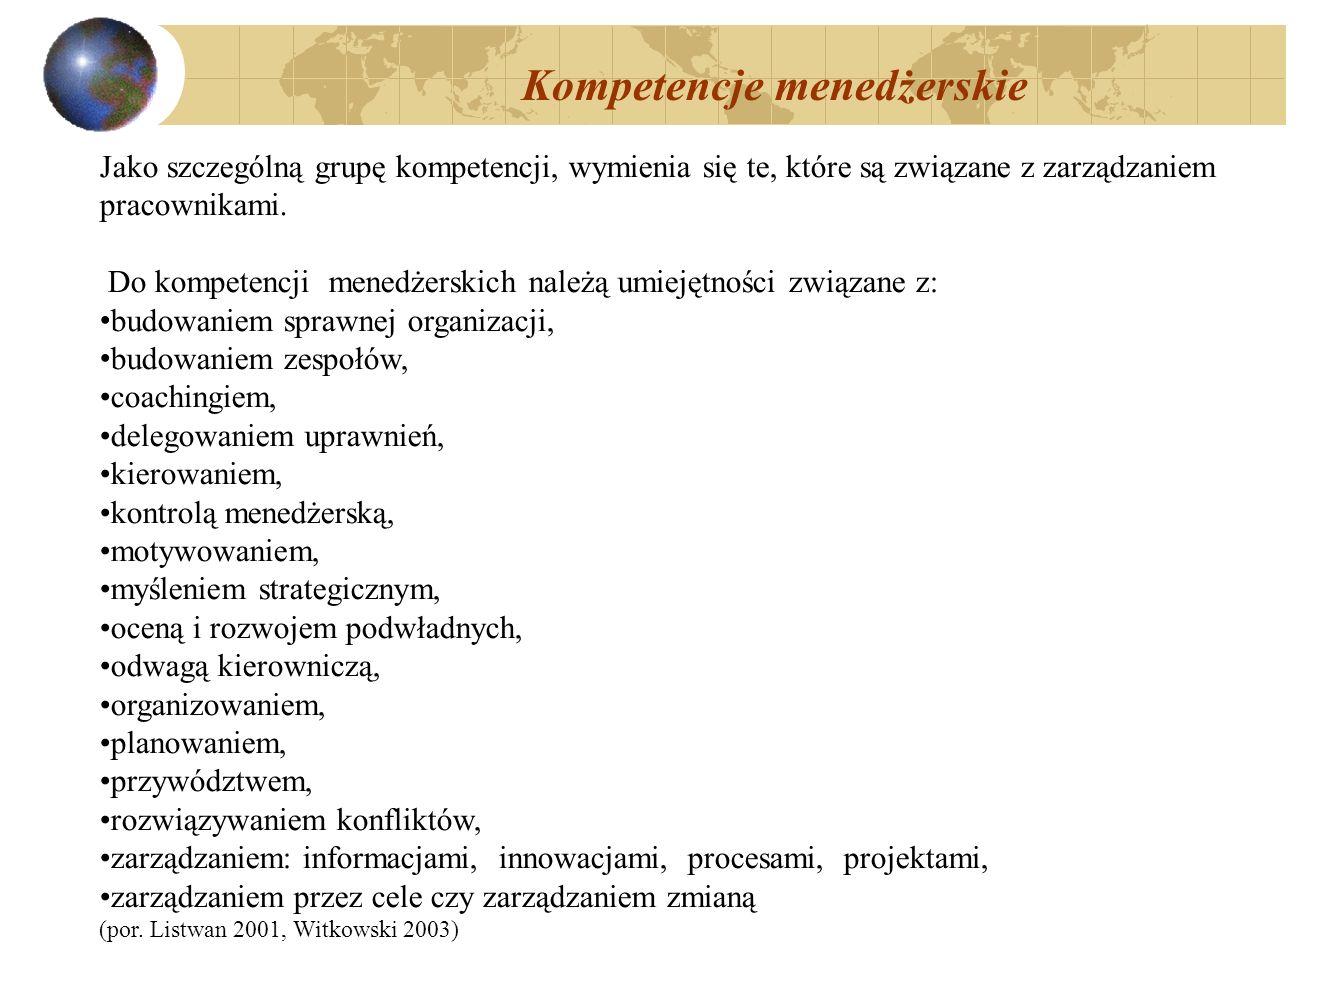 Kompetencje menedżerskie